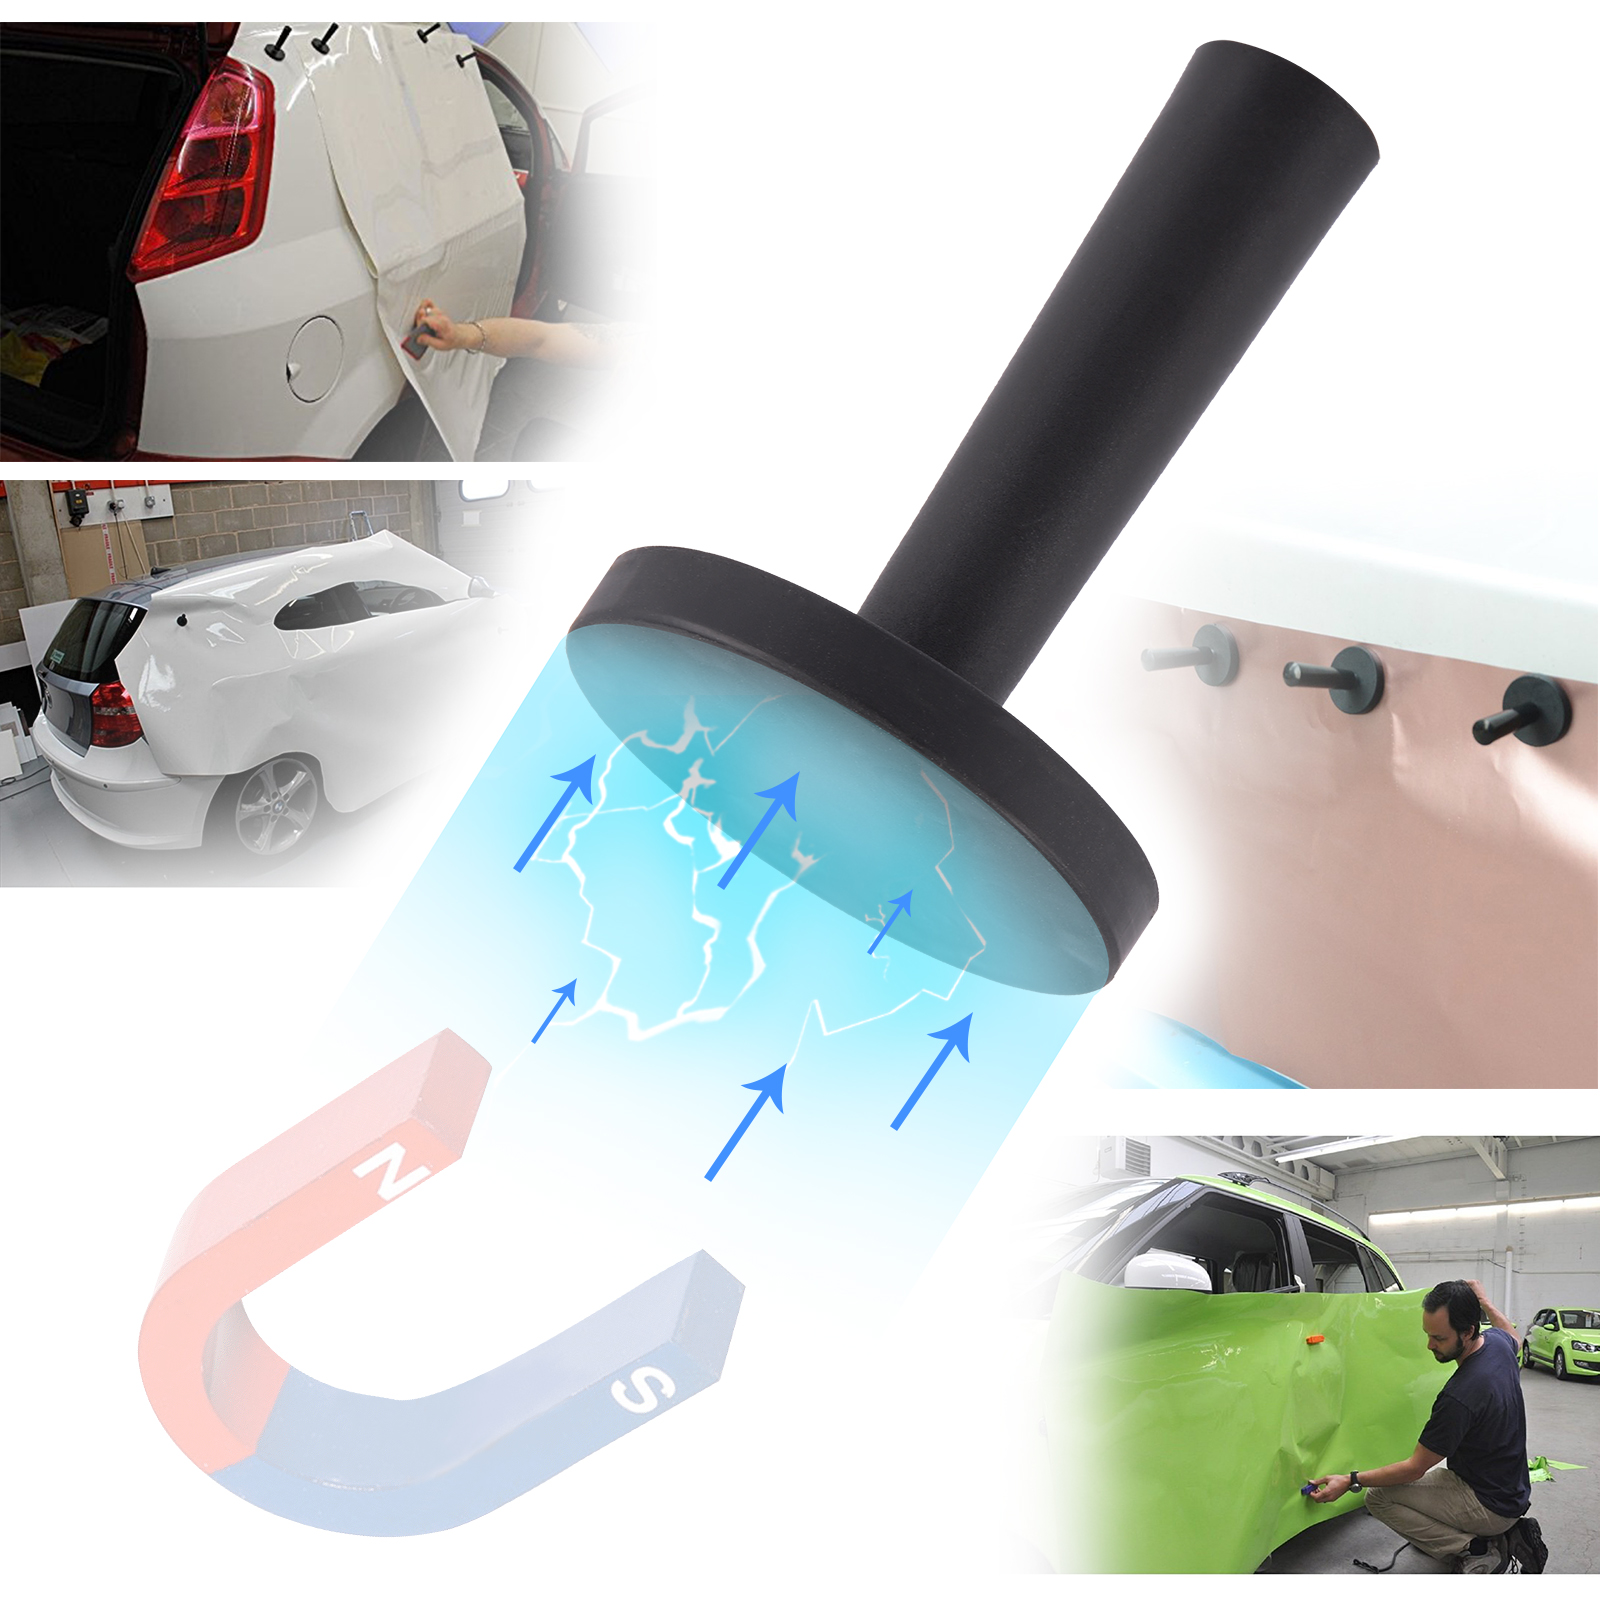 Image 5 - FOSHIO Car Vinyl Wrap Film Squeegee Scraper Tools Set Carbon Fiber Magnet Holders Car Sticker Cutter Knife Kit Car Accessories-in Scraper from Automobiles & Motorcycles